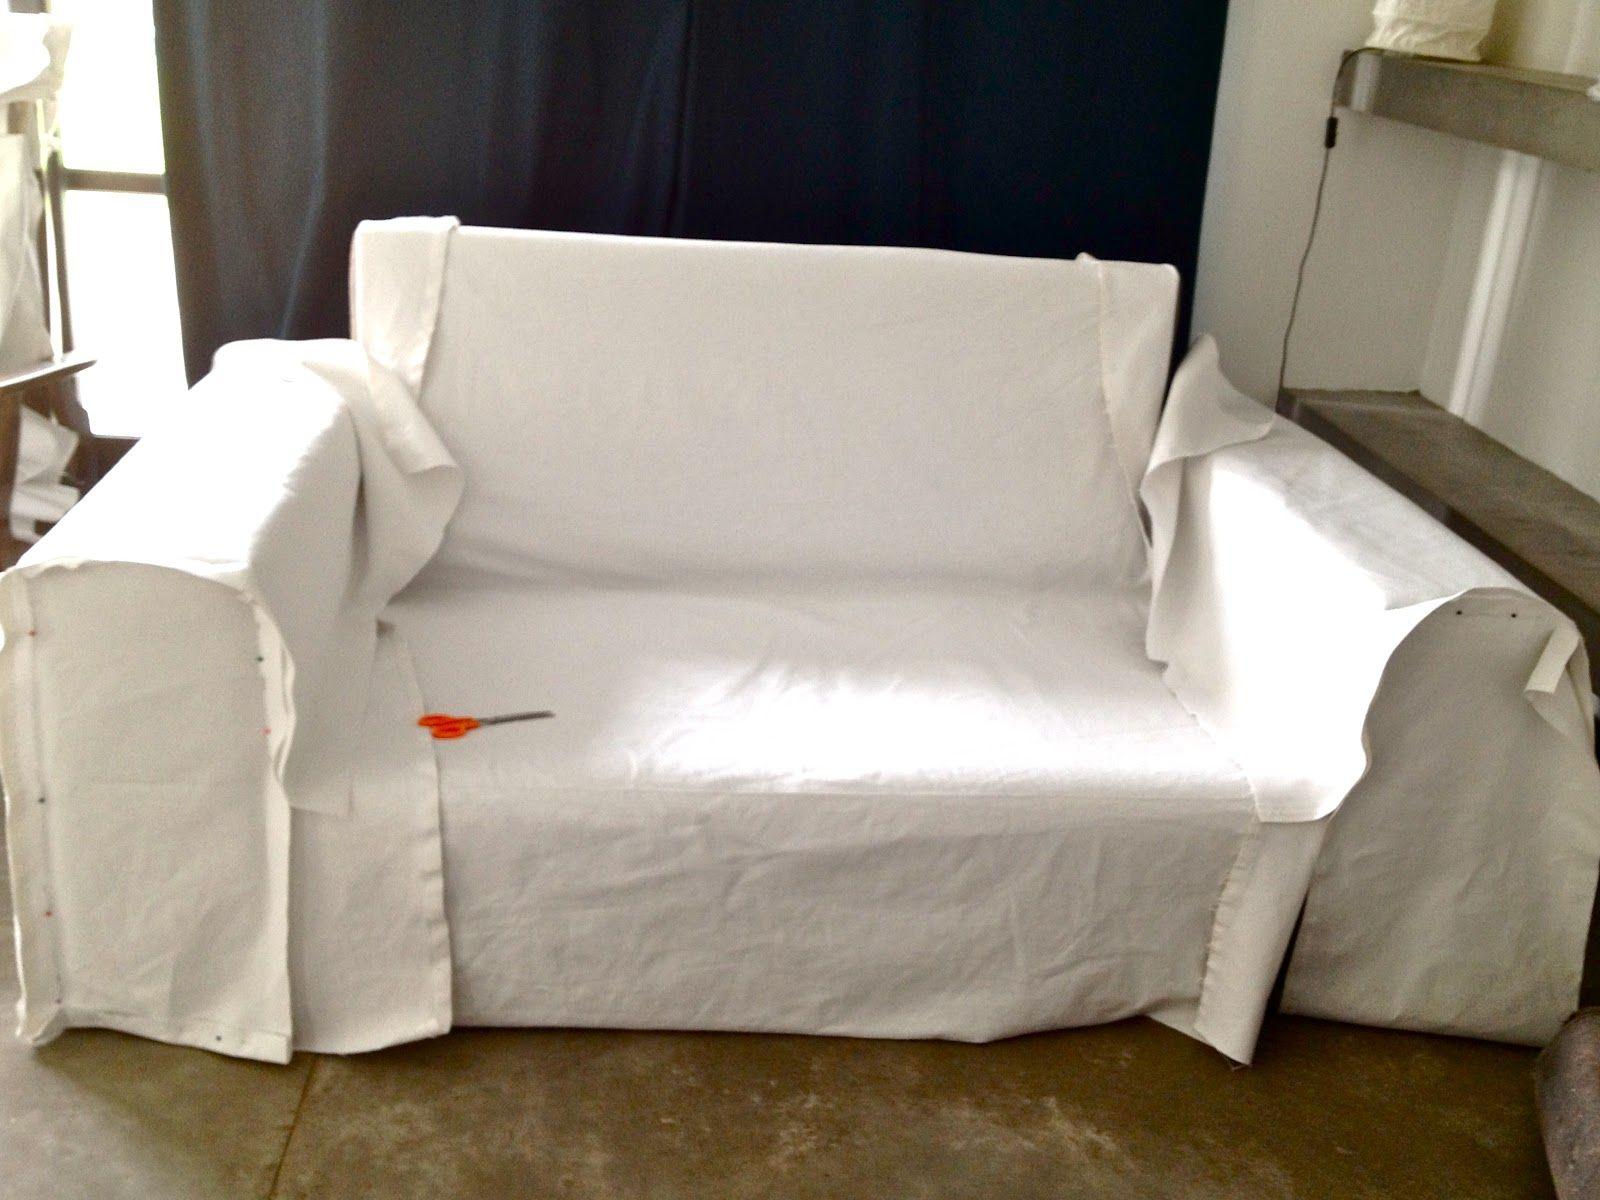 Funda blanca para mi sill n casi tutorial parte 2 for Forros para sillones